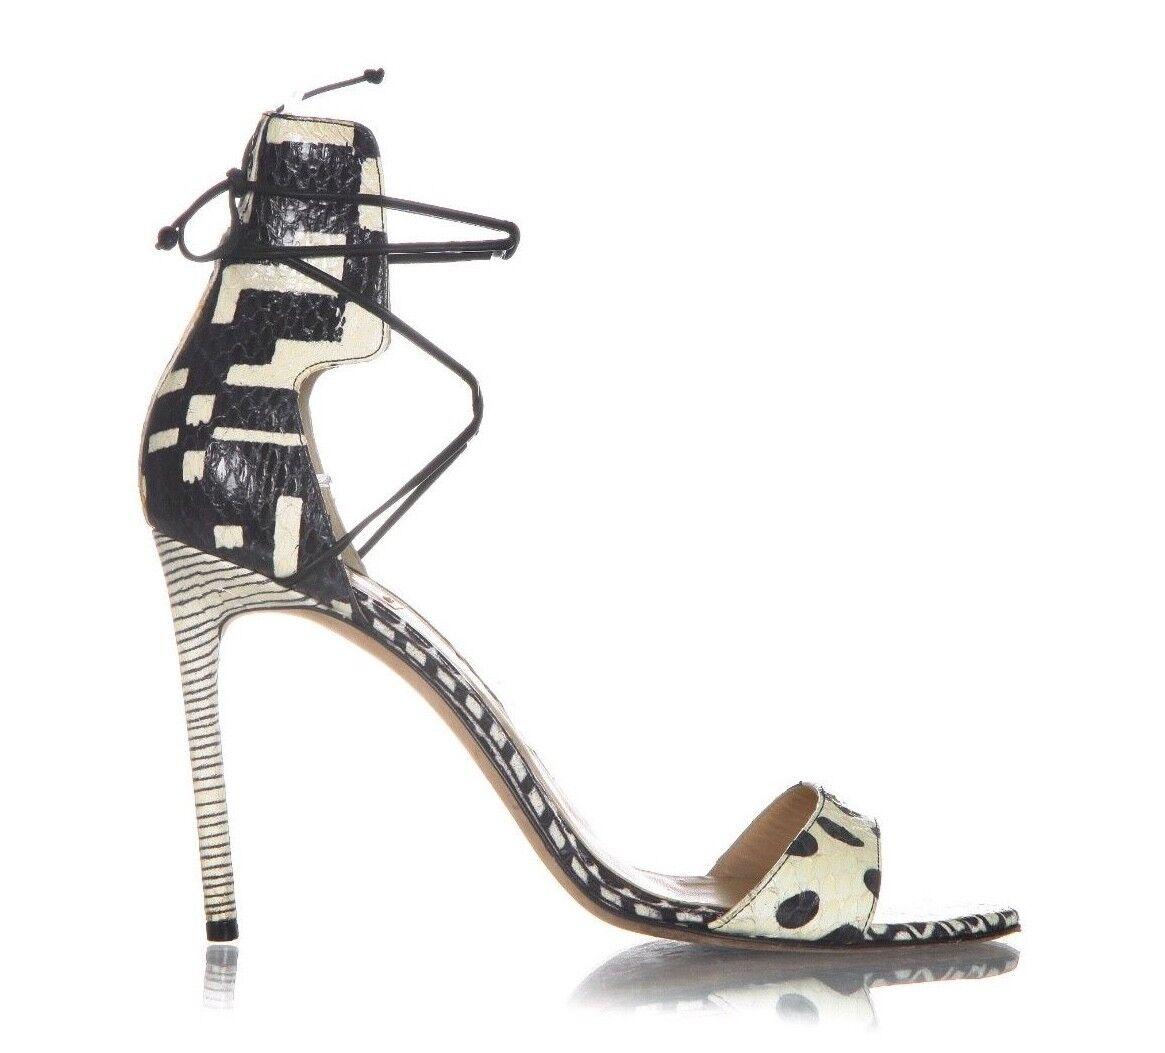 all'ingrosso a buon mercato REED KRAKOFF Heels 39.5 nero Cream Snakeskin Snakeskin Snakeskin Open Toe Ankle Tie Stiletto Pumps  ti aspetto